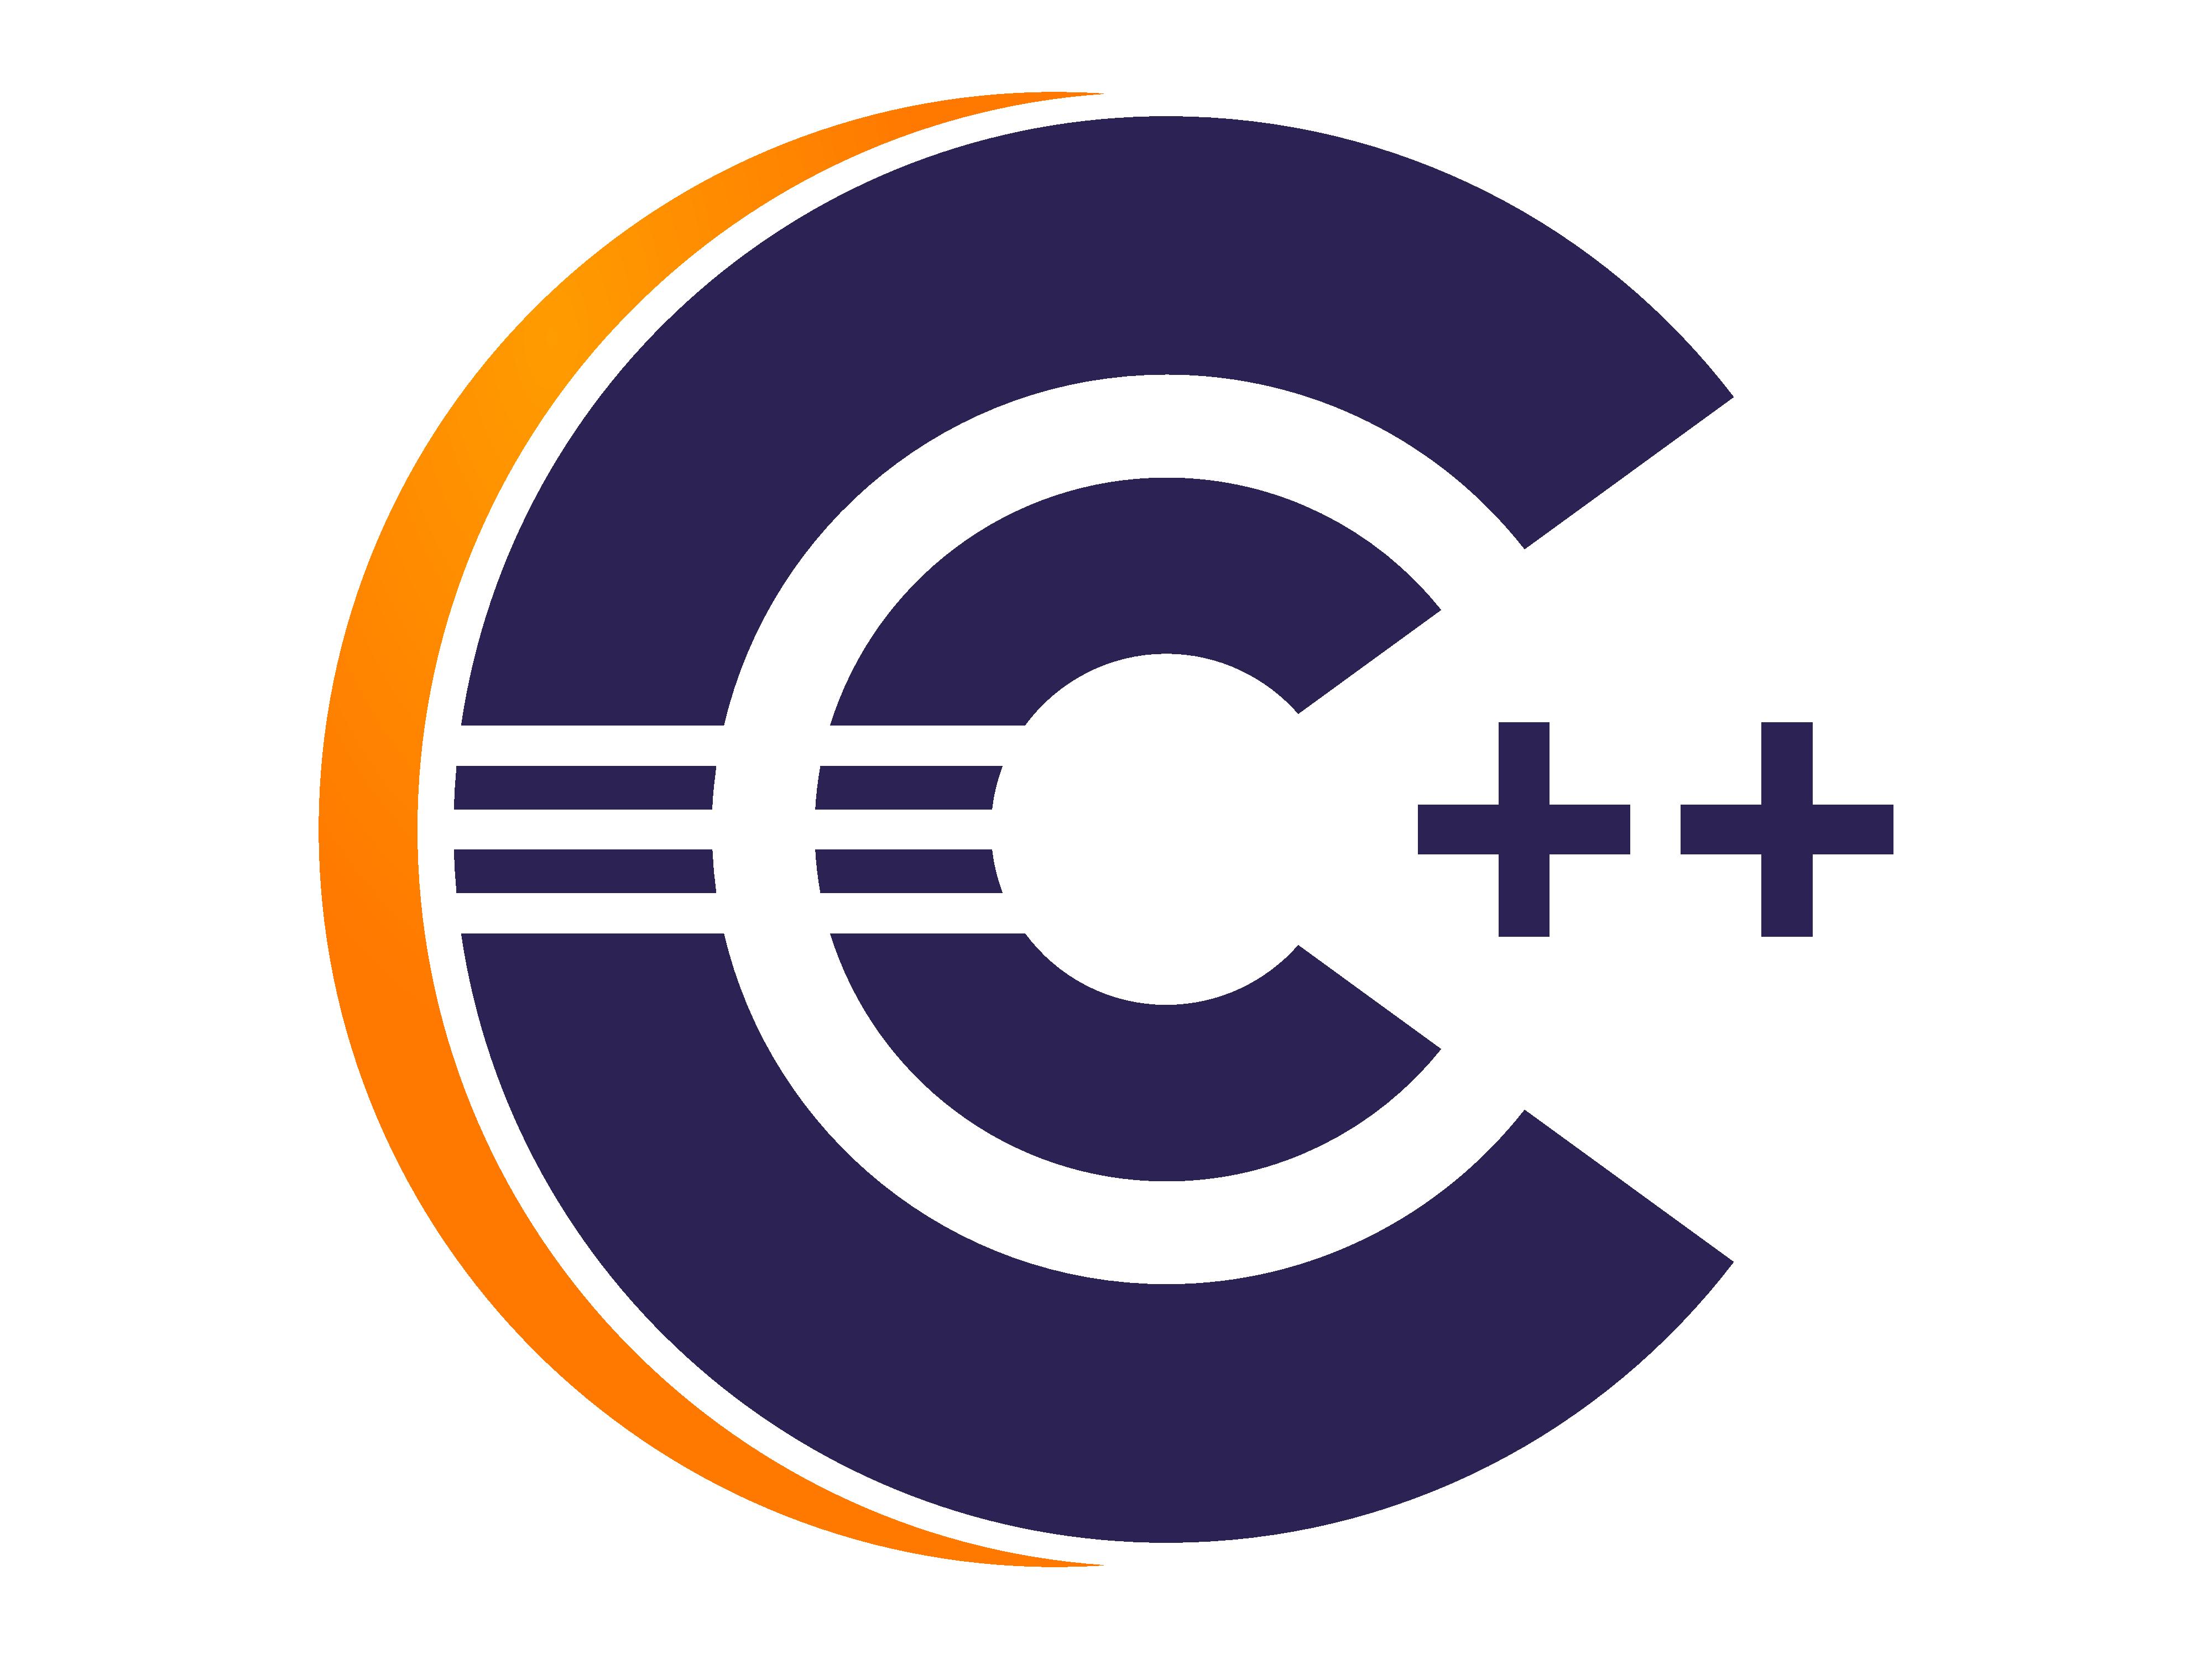 C++ PNG Image.